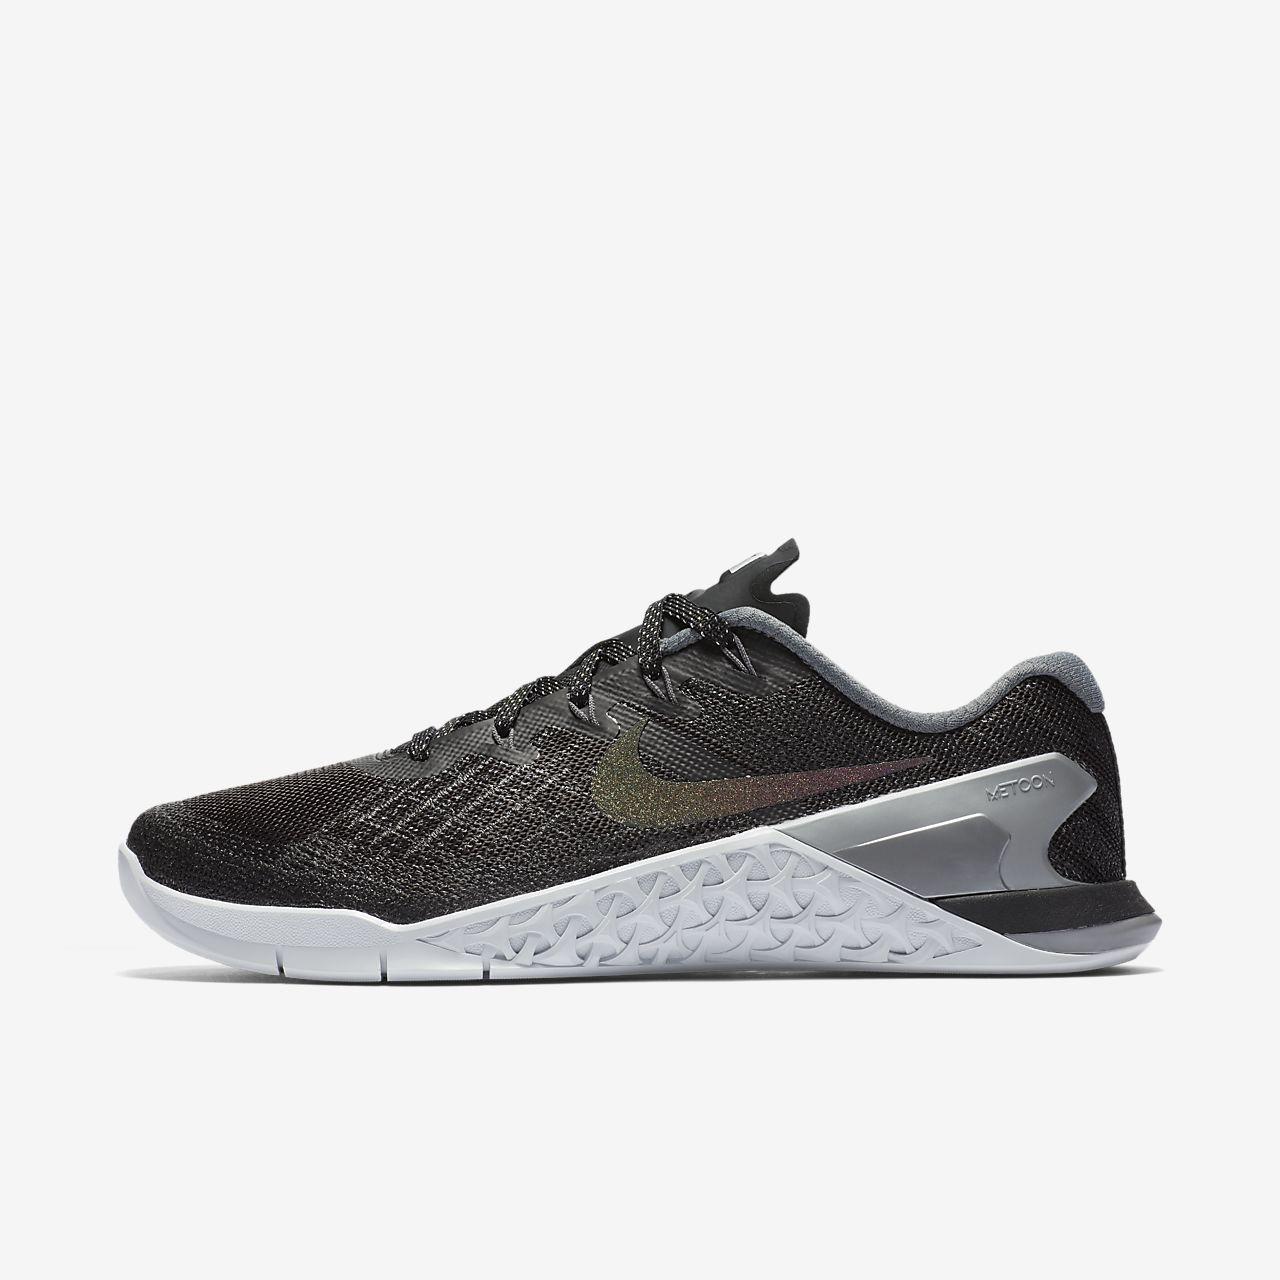 Women's Nike Metcon 3 METALLIC Black/ Silver (922880-001) Size 6